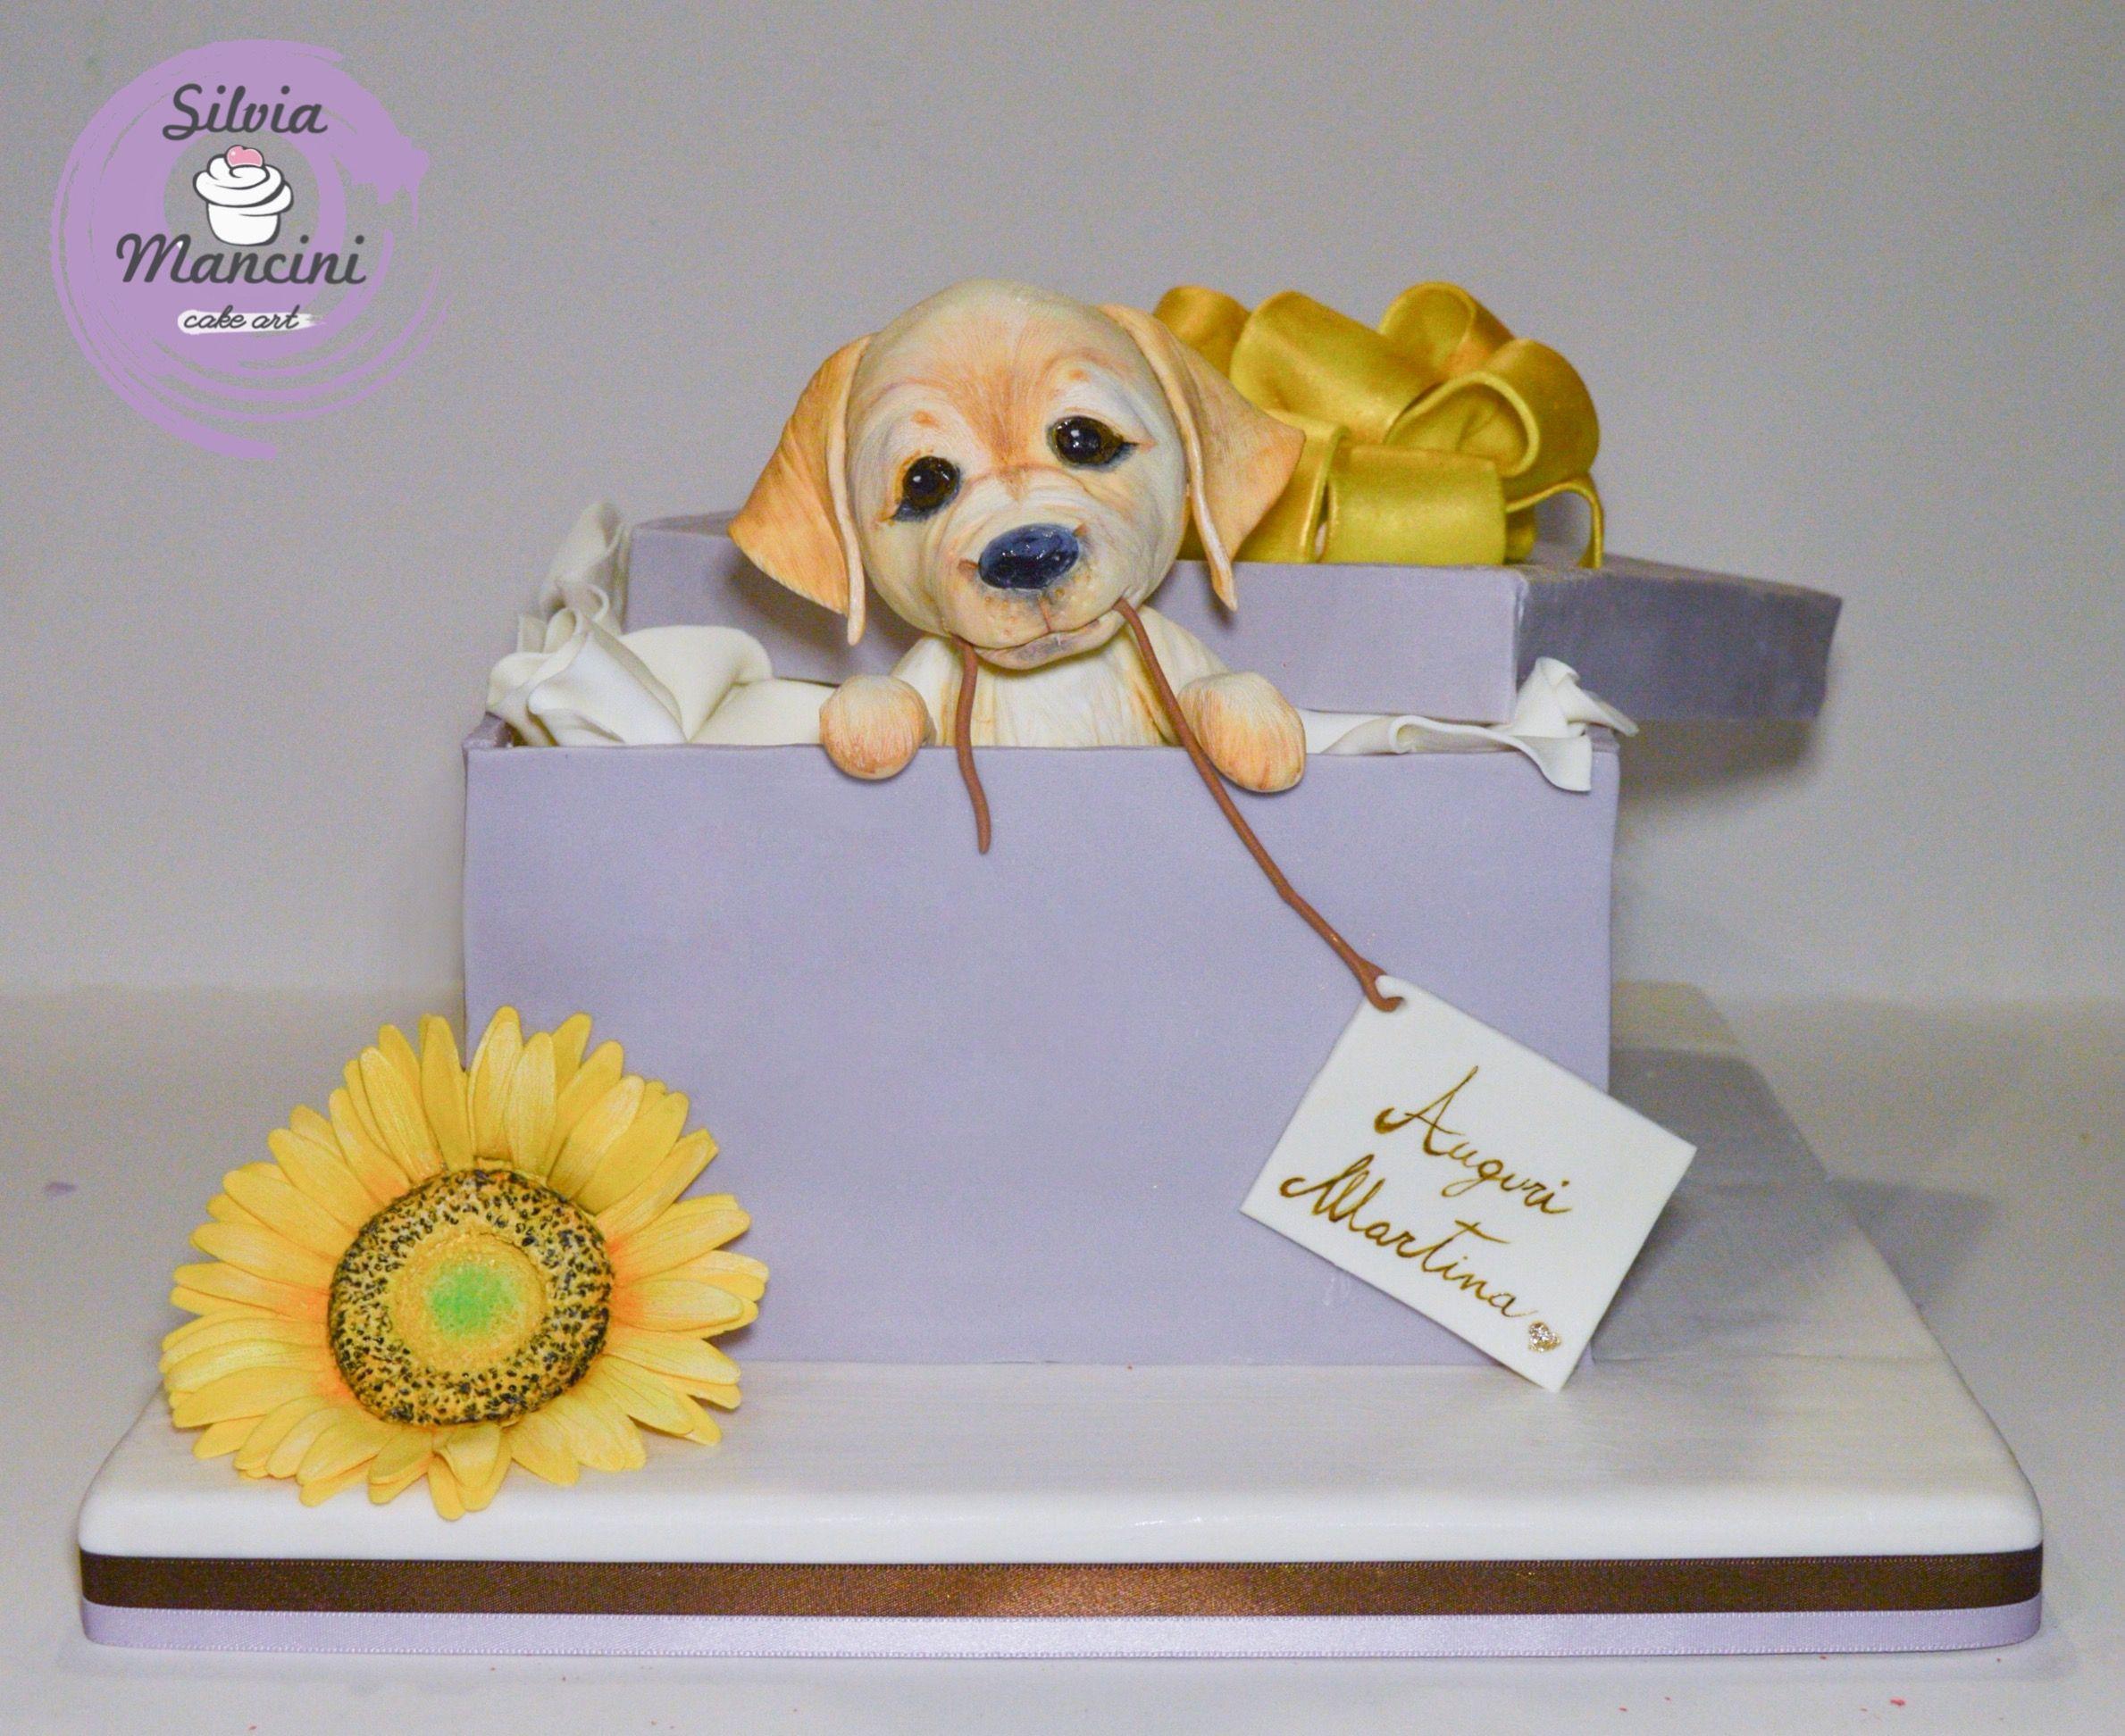 Cake for a girl cakes silvia mancini pinterest cake